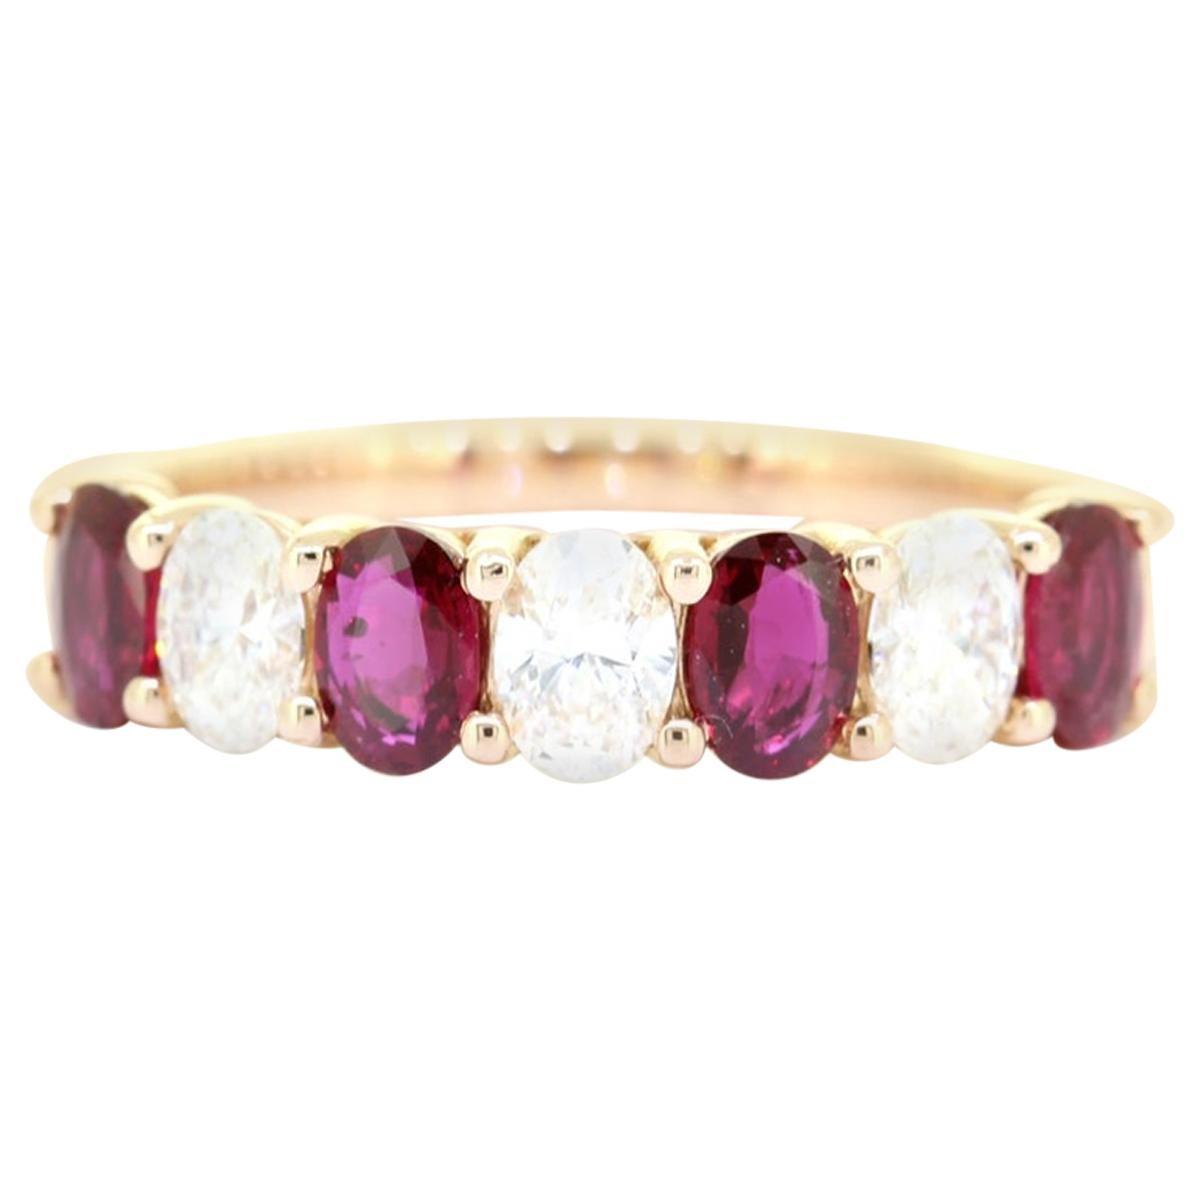 Classic Oval Cut 1.50 Carat Seven Stone Ruby Diamond Ring 18 Karat Yellow Gold